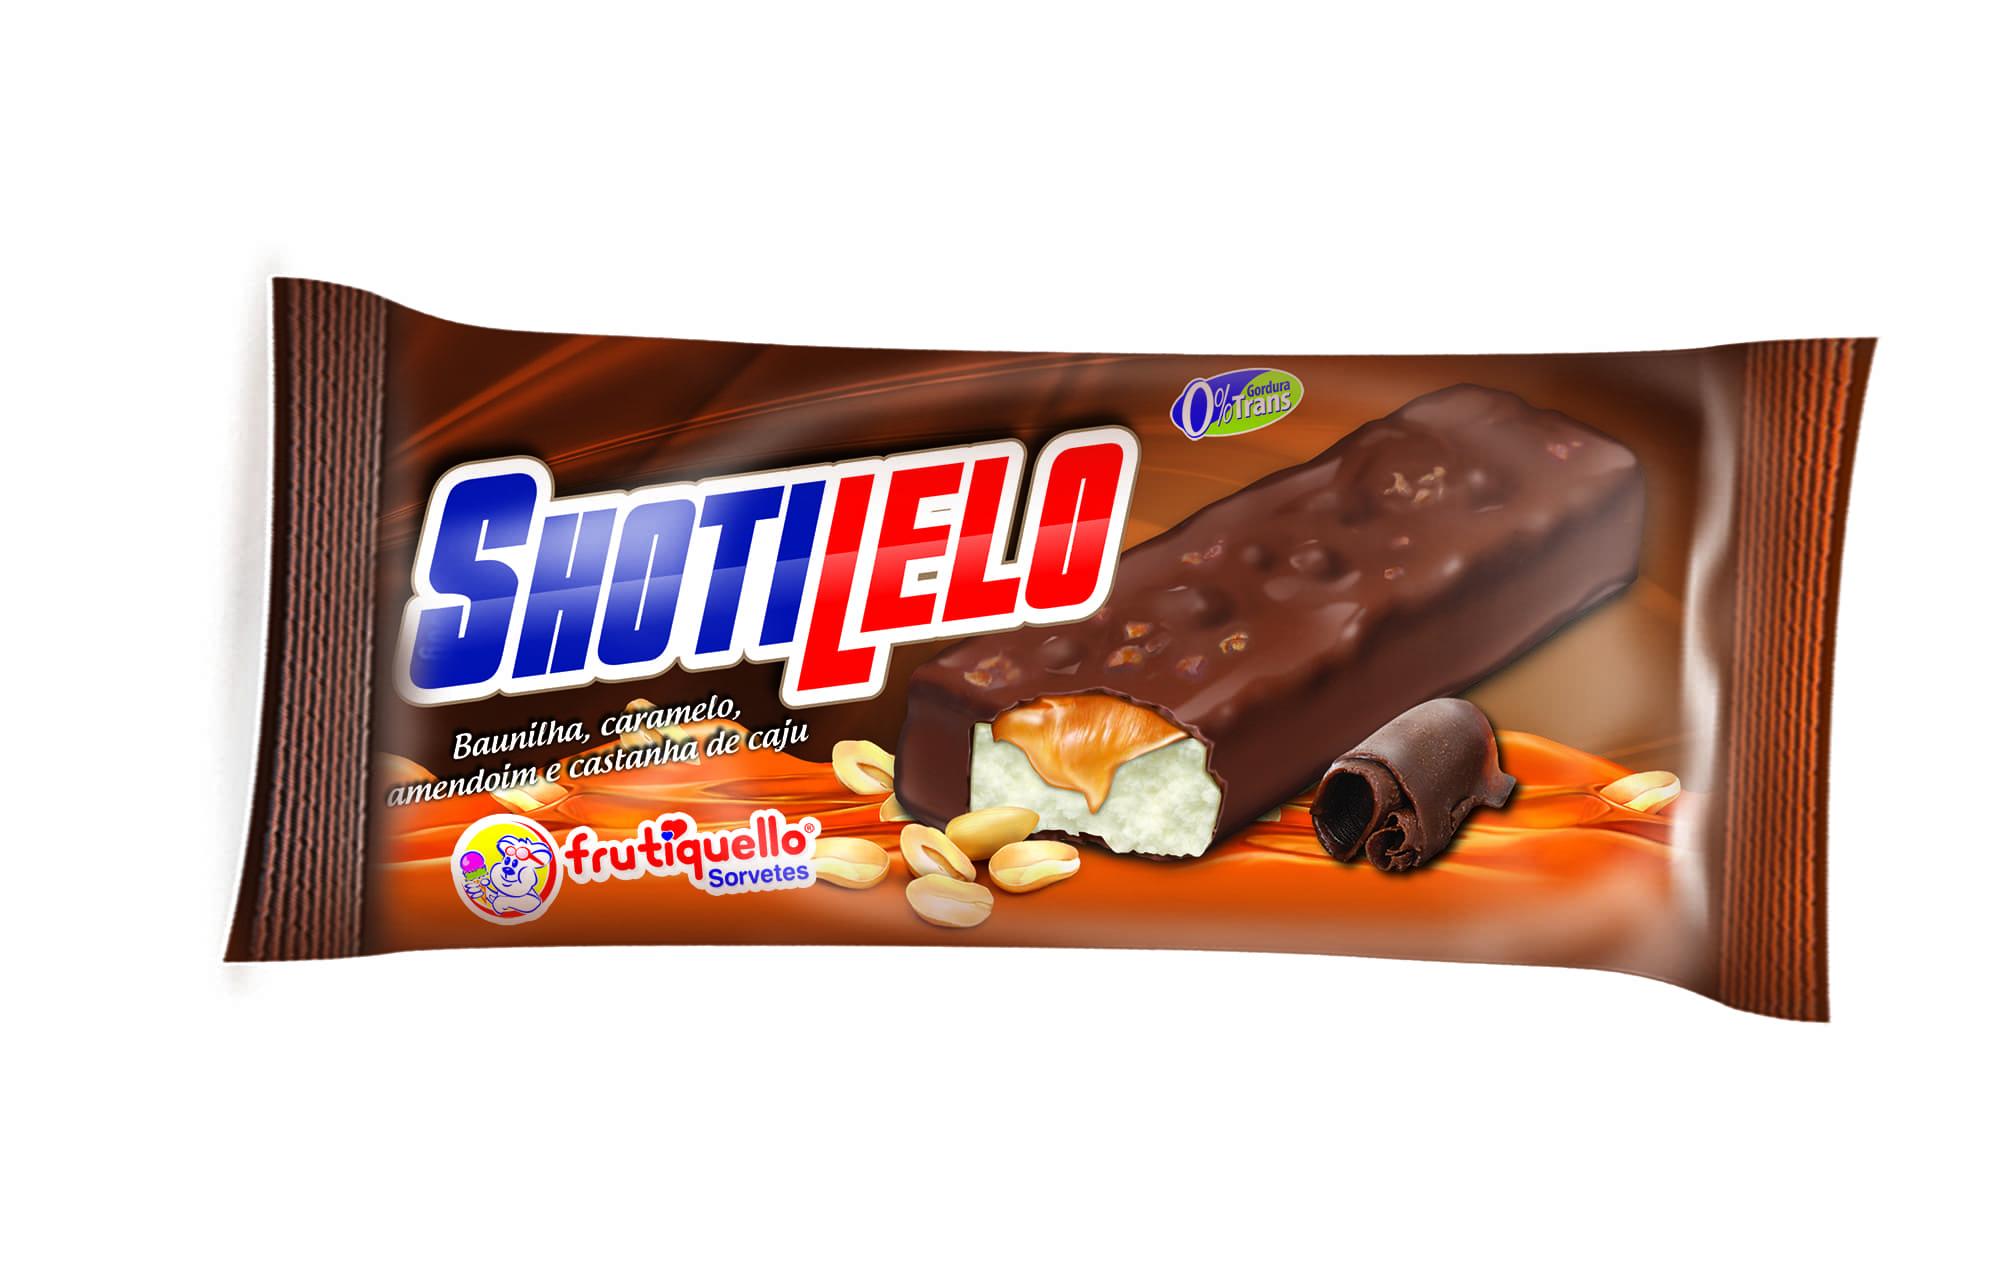 Shotilelo